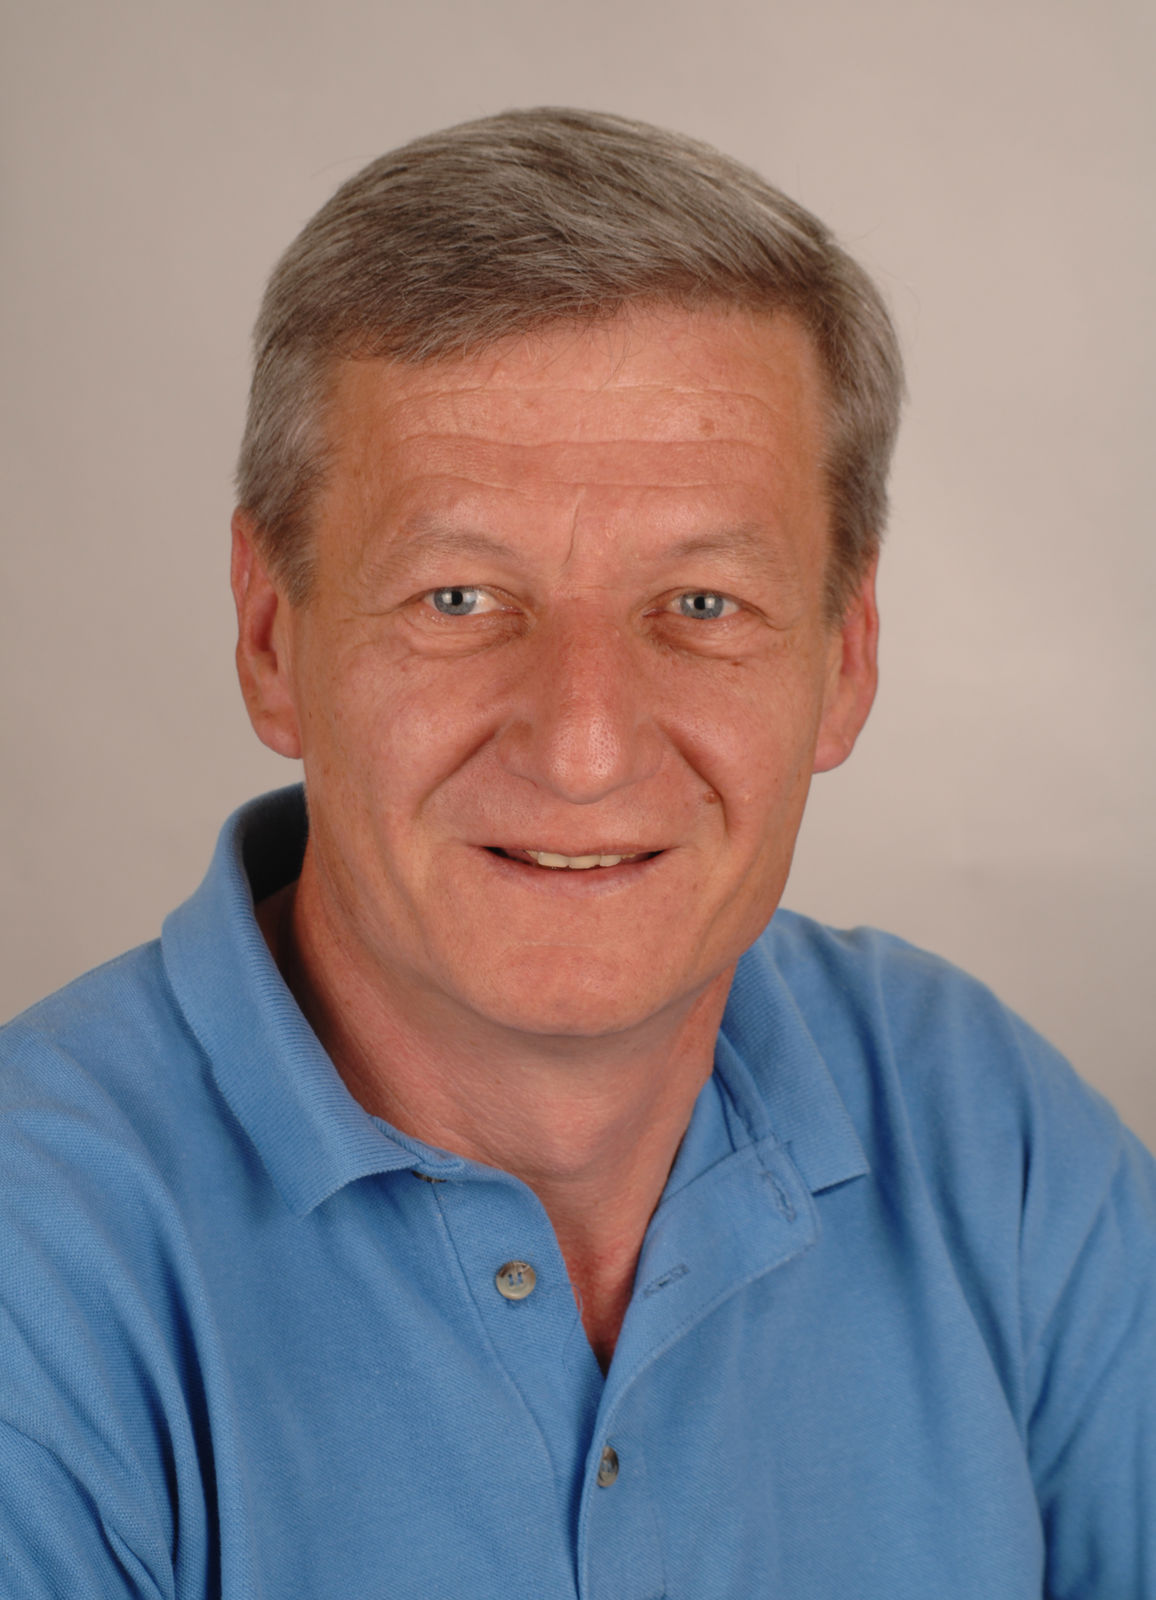 Gerhard Hoppe